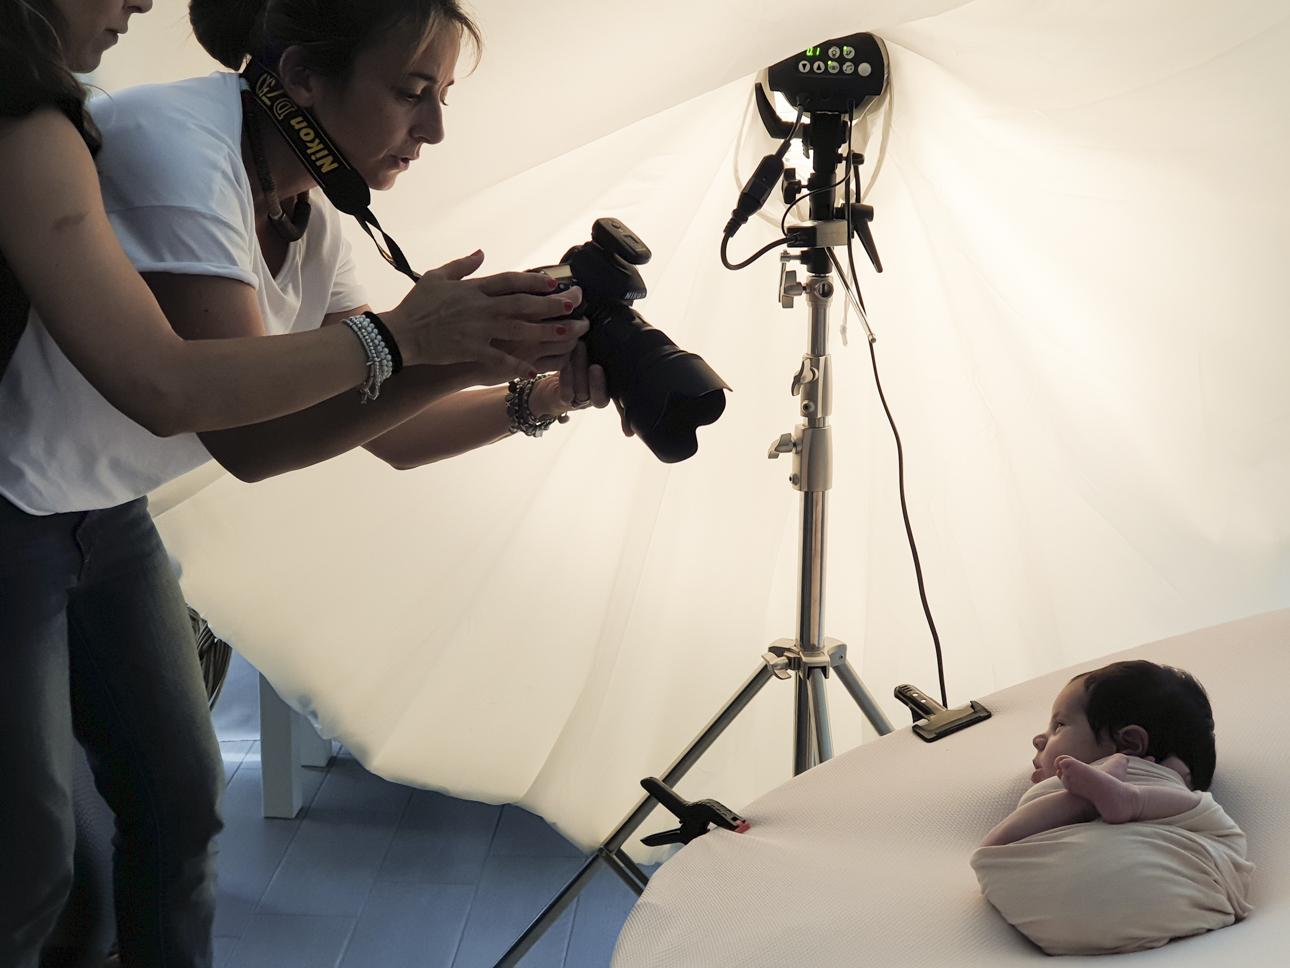 francesca-guerrini-foto-neonati-firenze-mentoring-toscana-puglia-newborn-mentoring-prato-pistoia-pisa-4